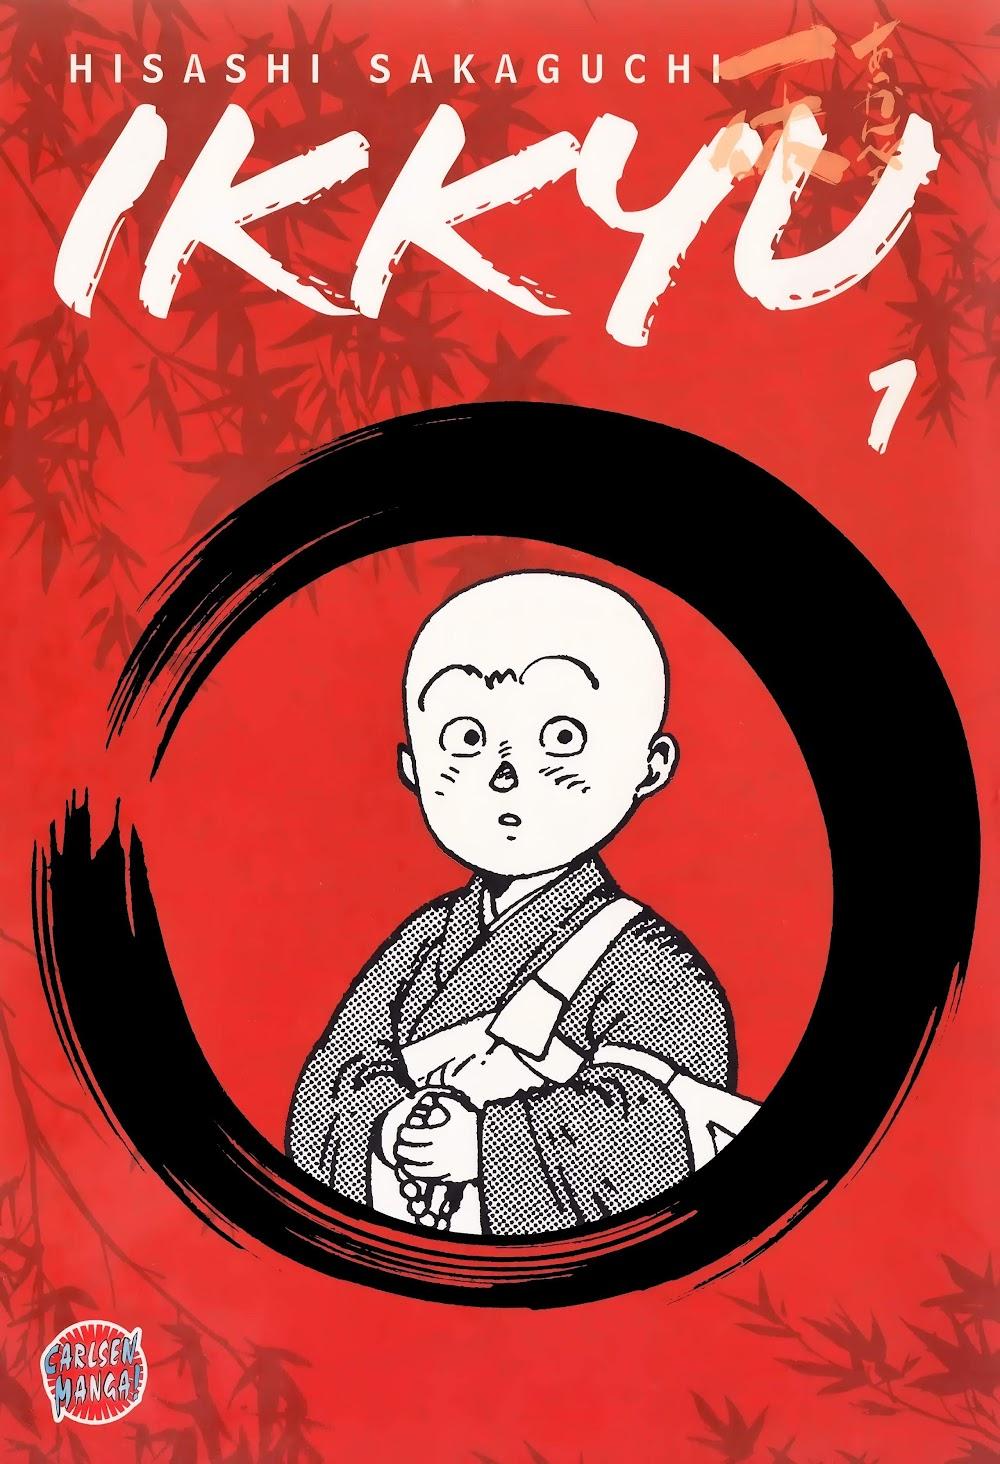 Ikkyu (2008) - komplett